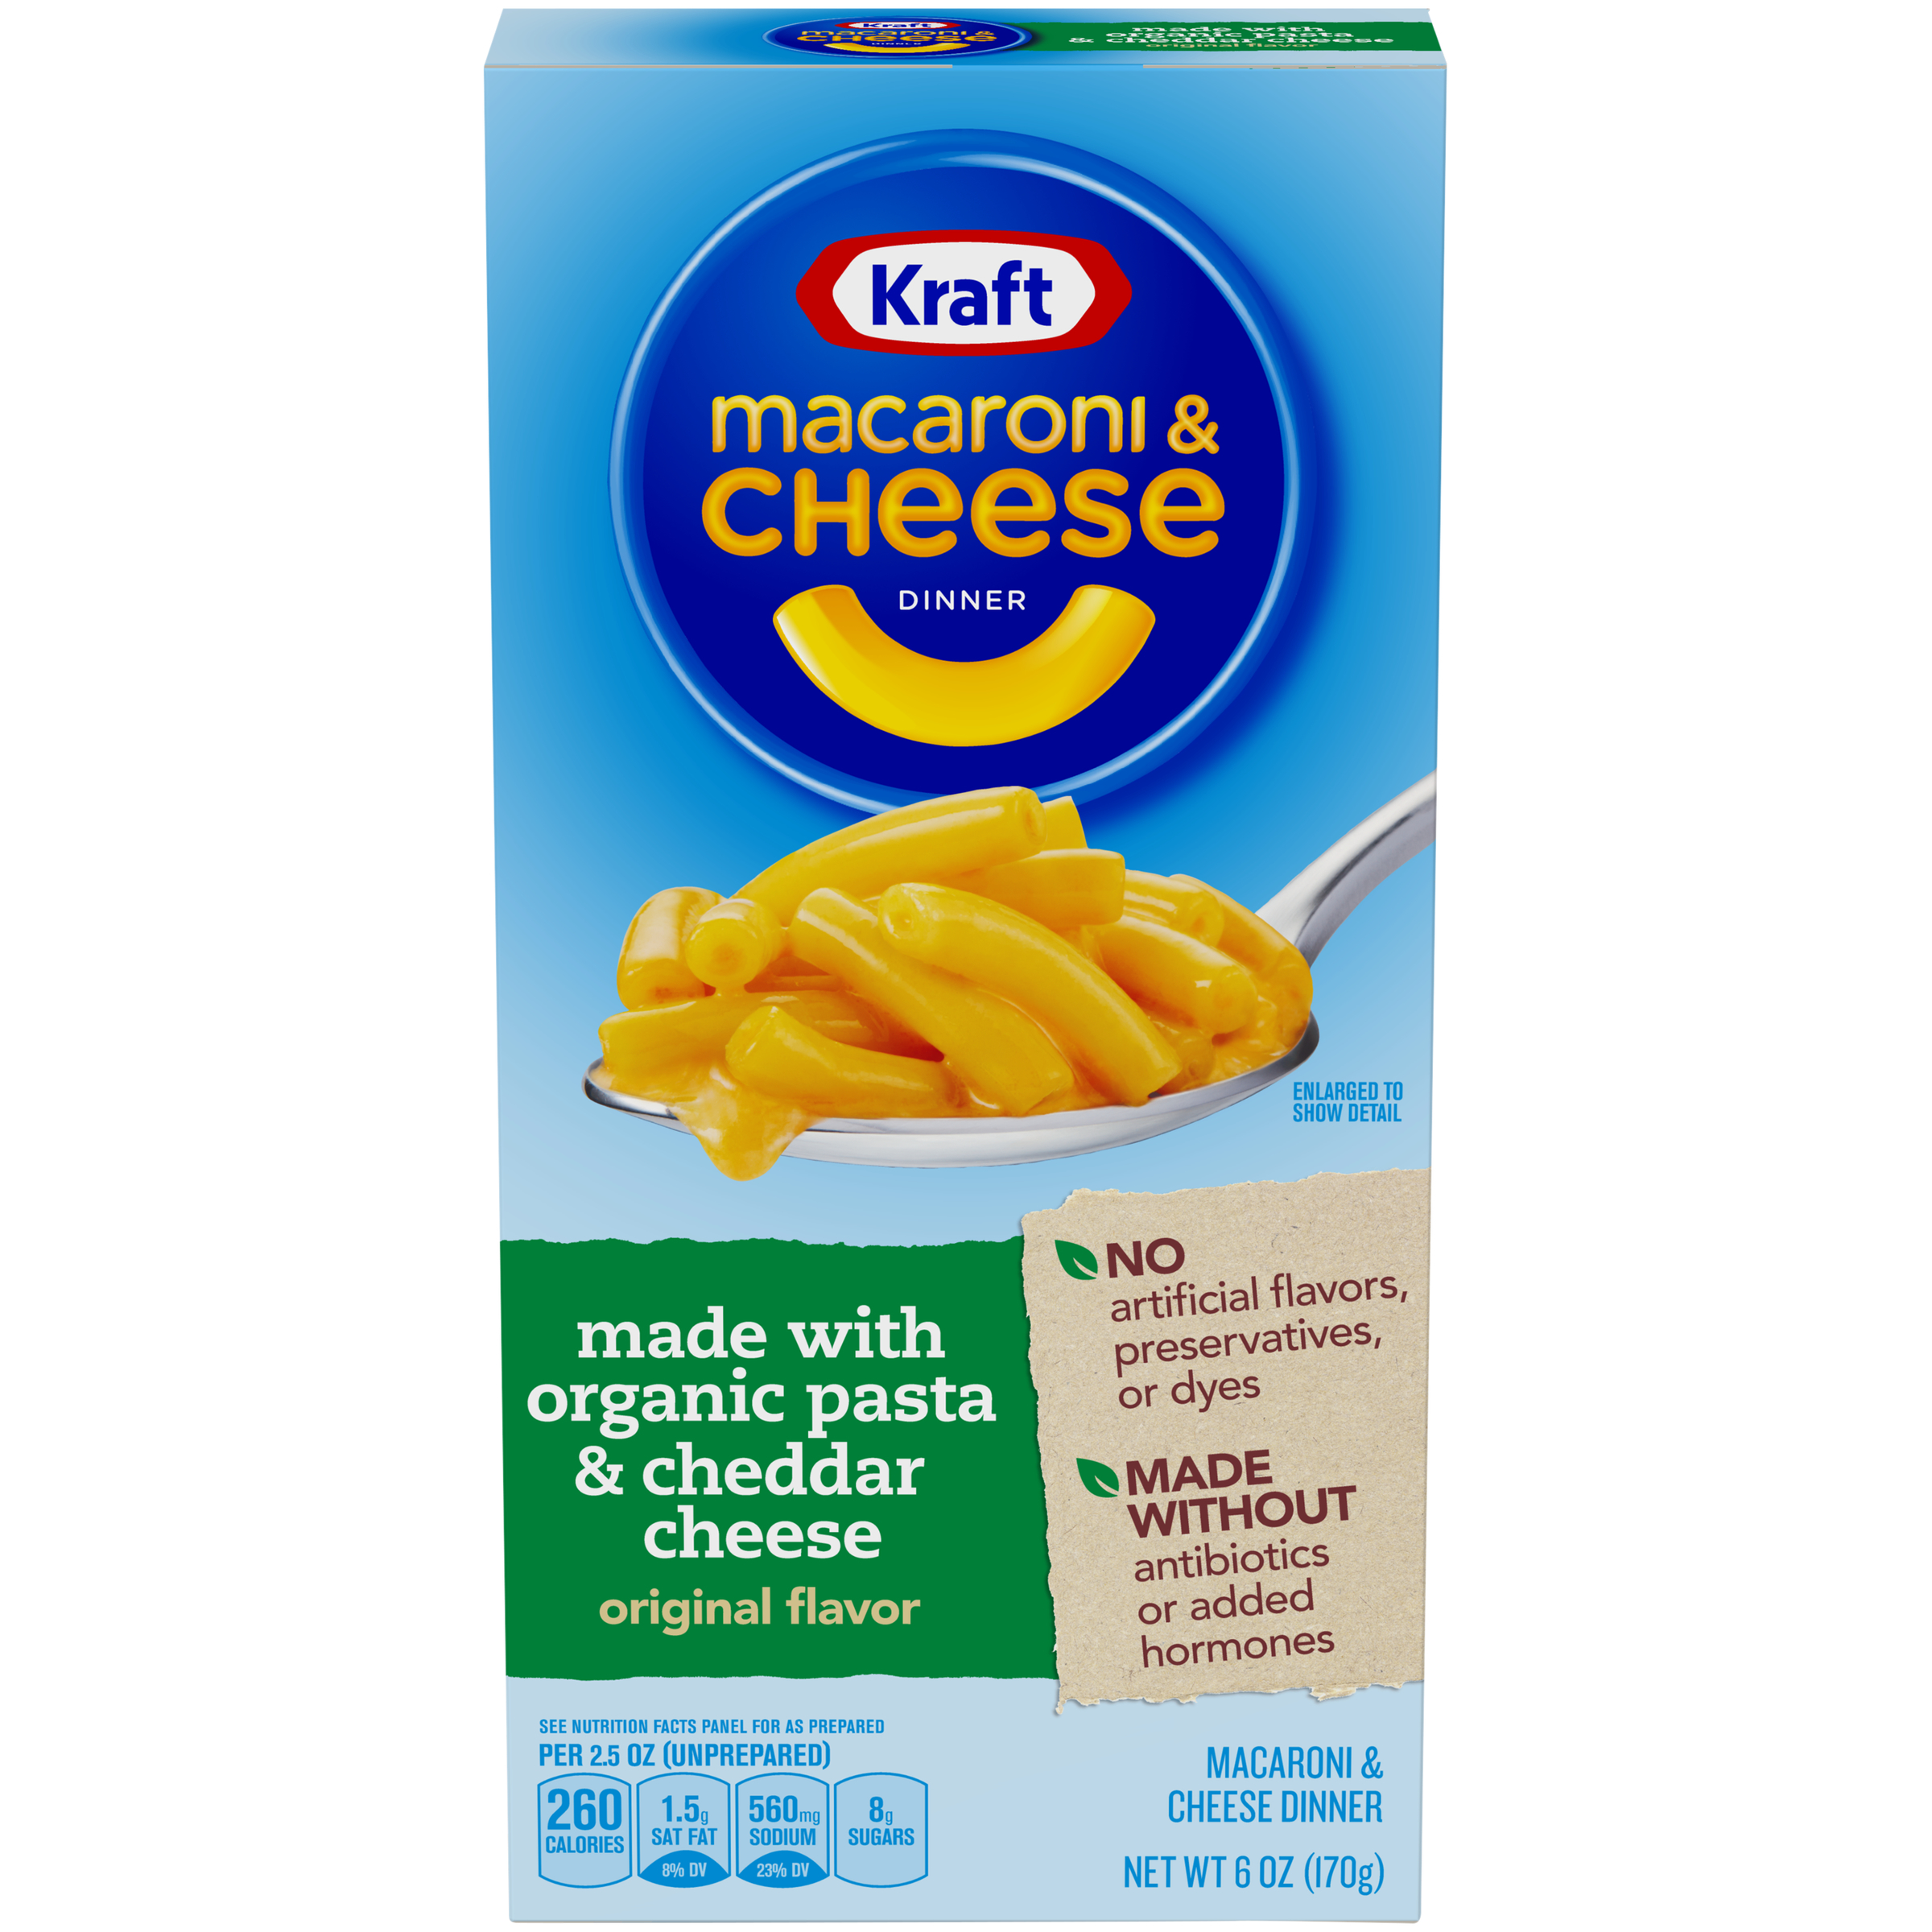 Kraft Original Flavor Macaroni & Cheese Dinner made with ...